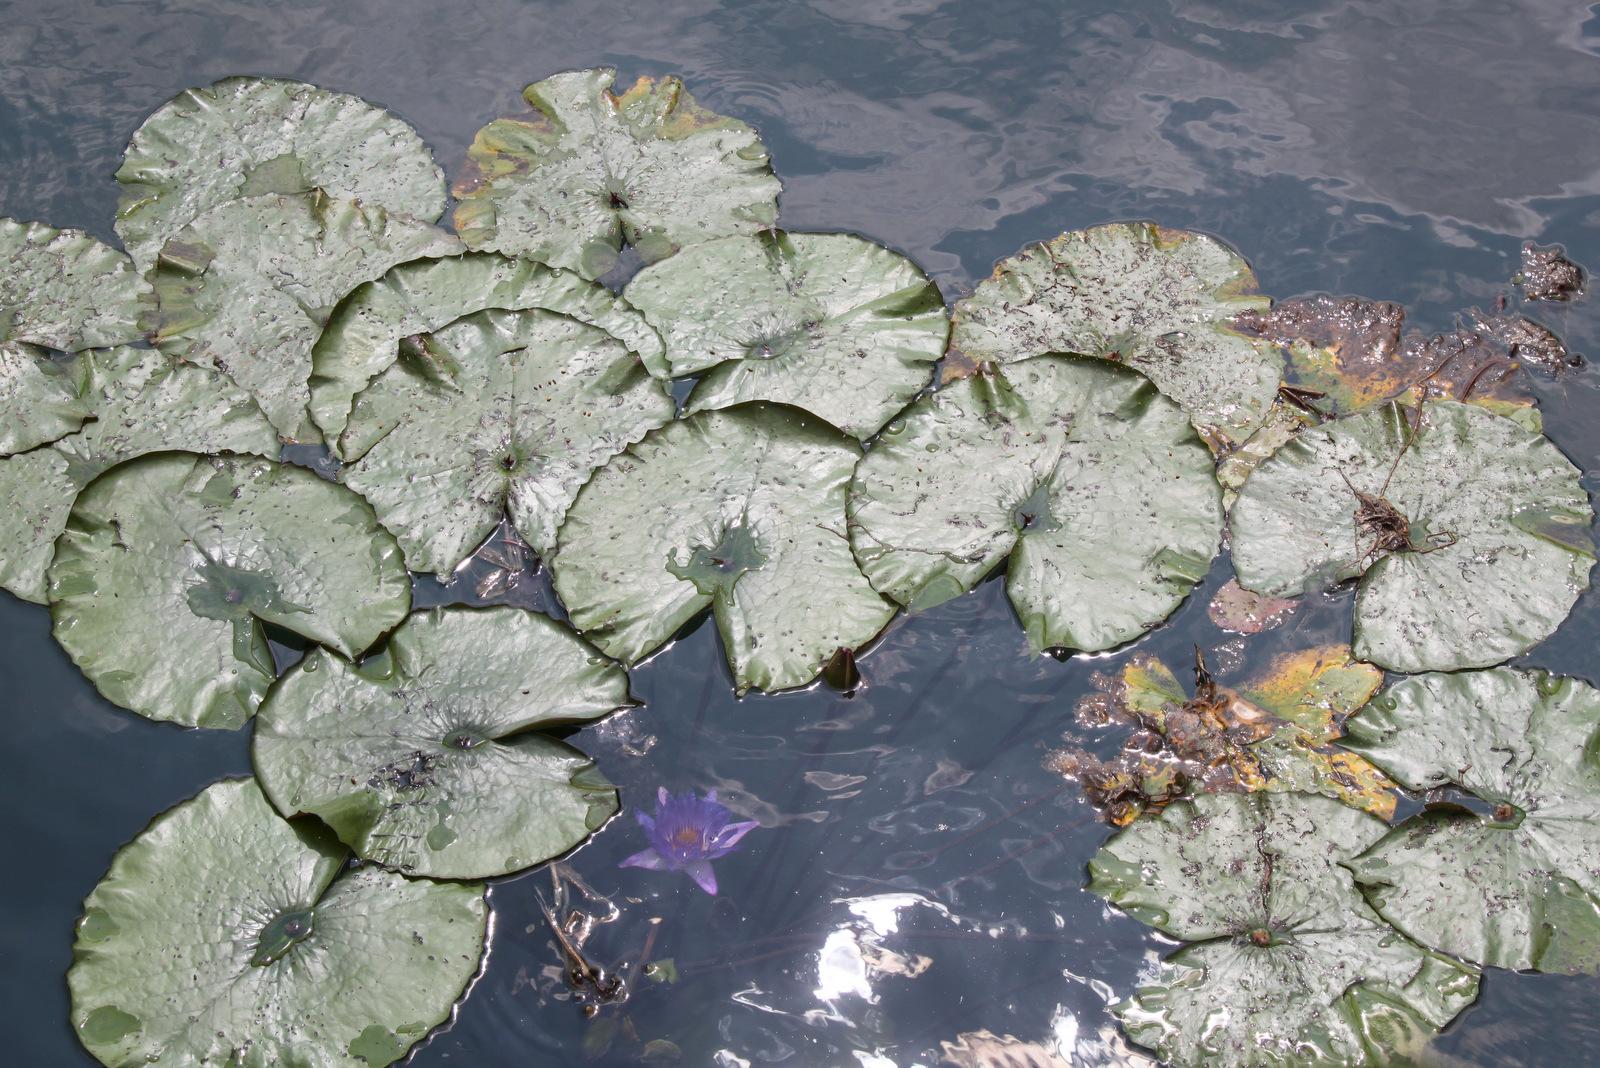 Heviz termalno jezero